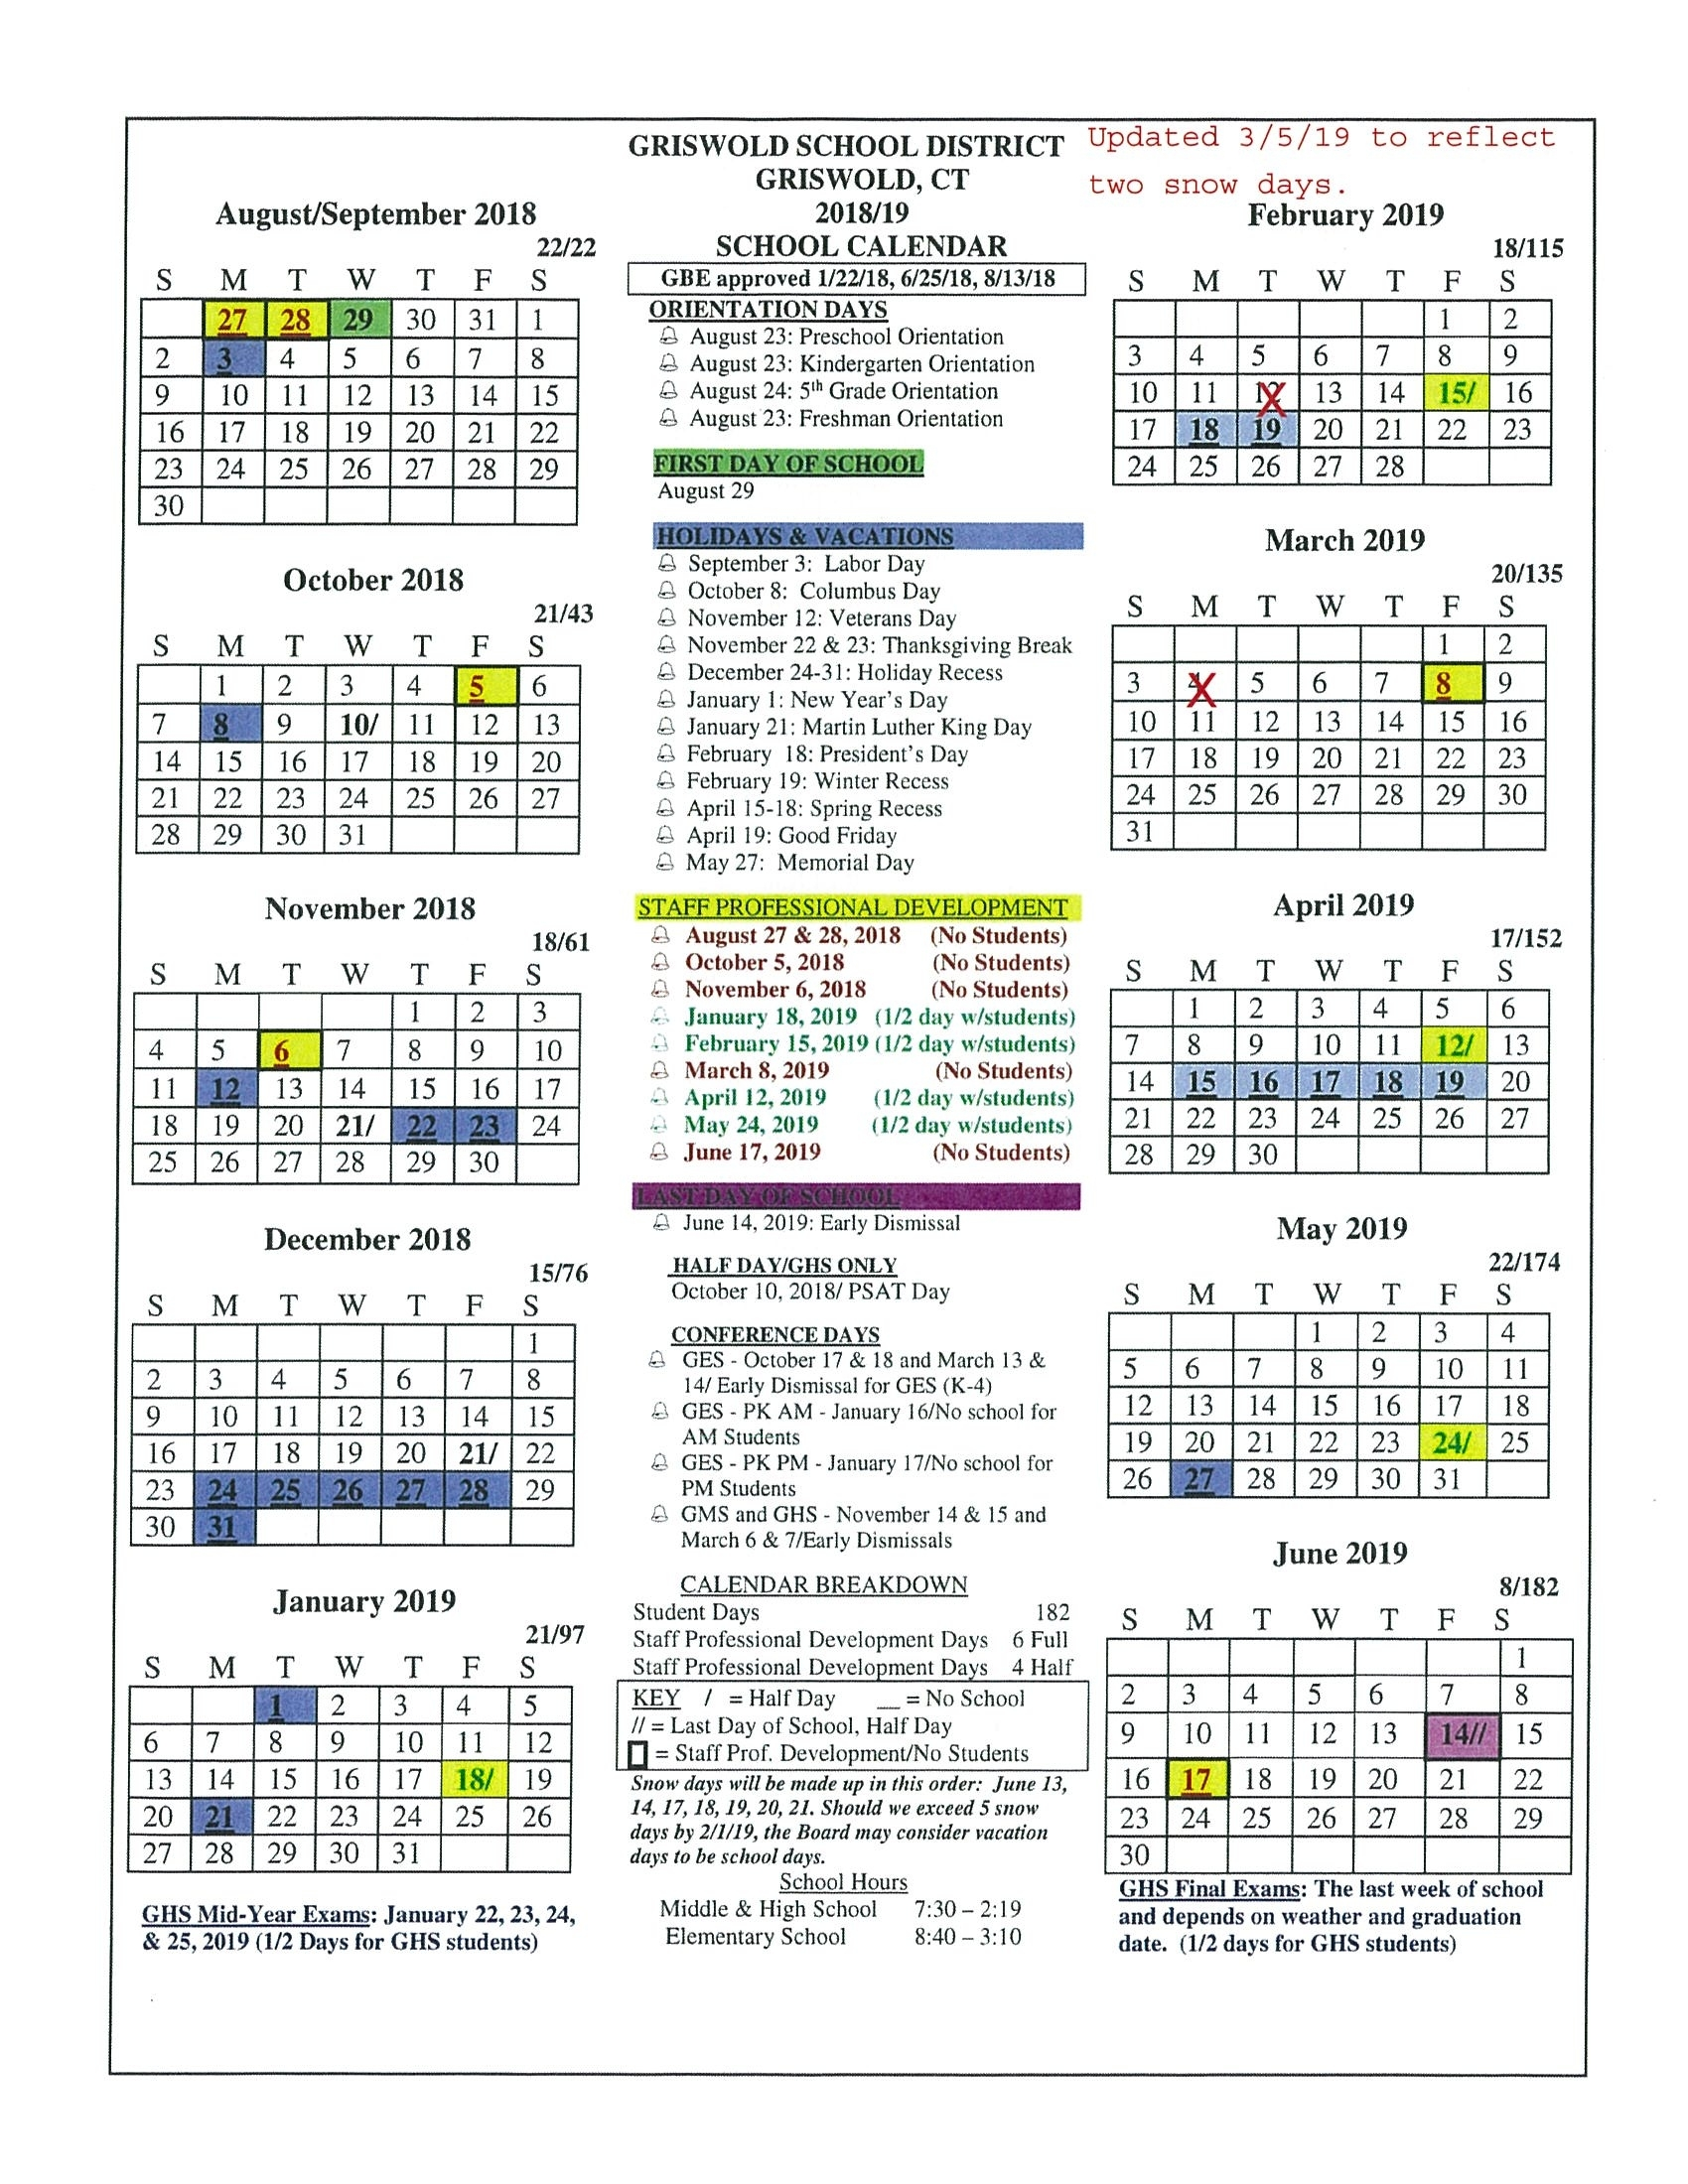 Board Approved Academic Calendar - Griswold Public Schools Exceptional 9 Week School Calendar